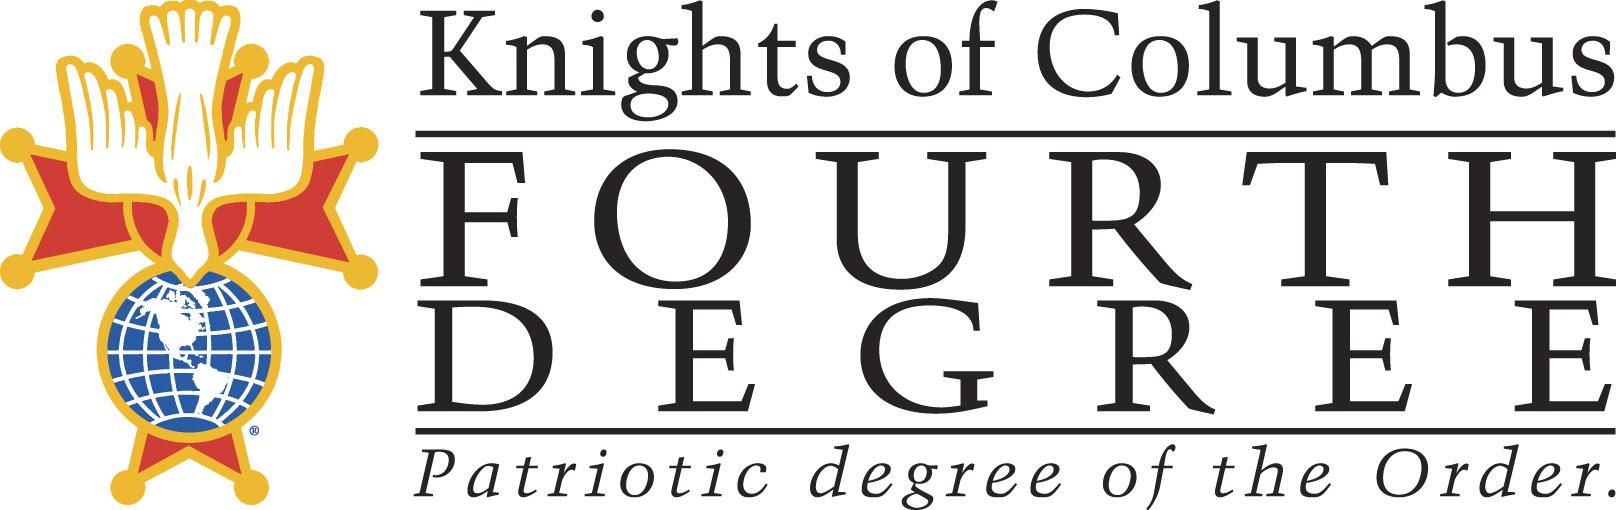 Knights Of Columbus 4th Degree Emblem